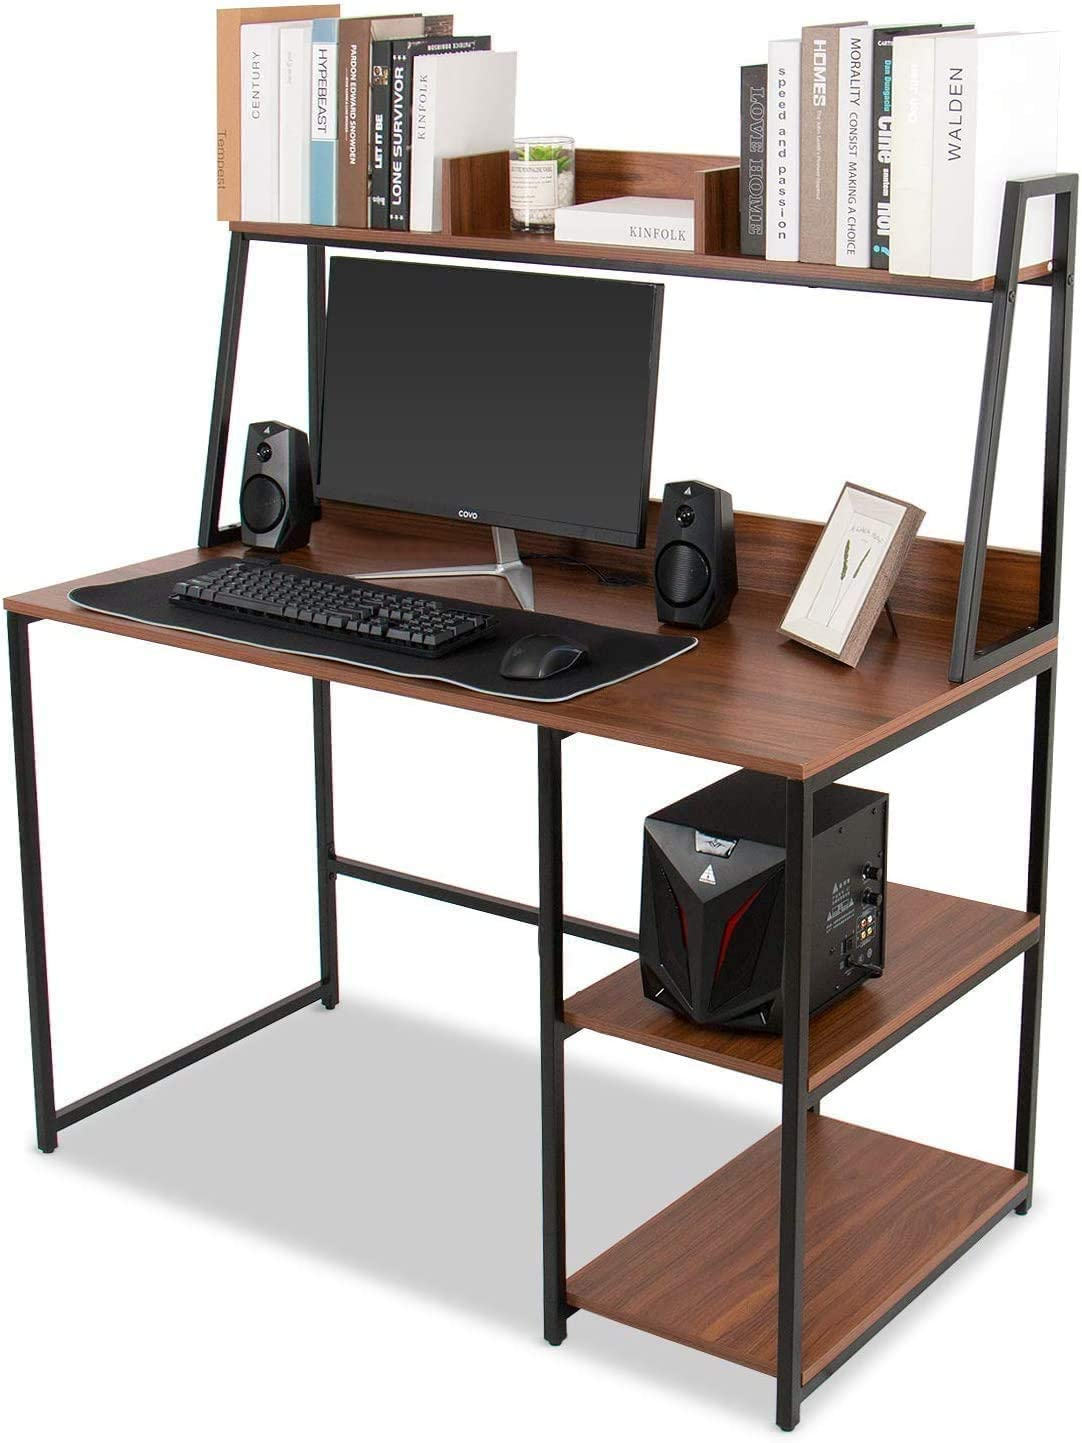 ELECWISH Computer Desk